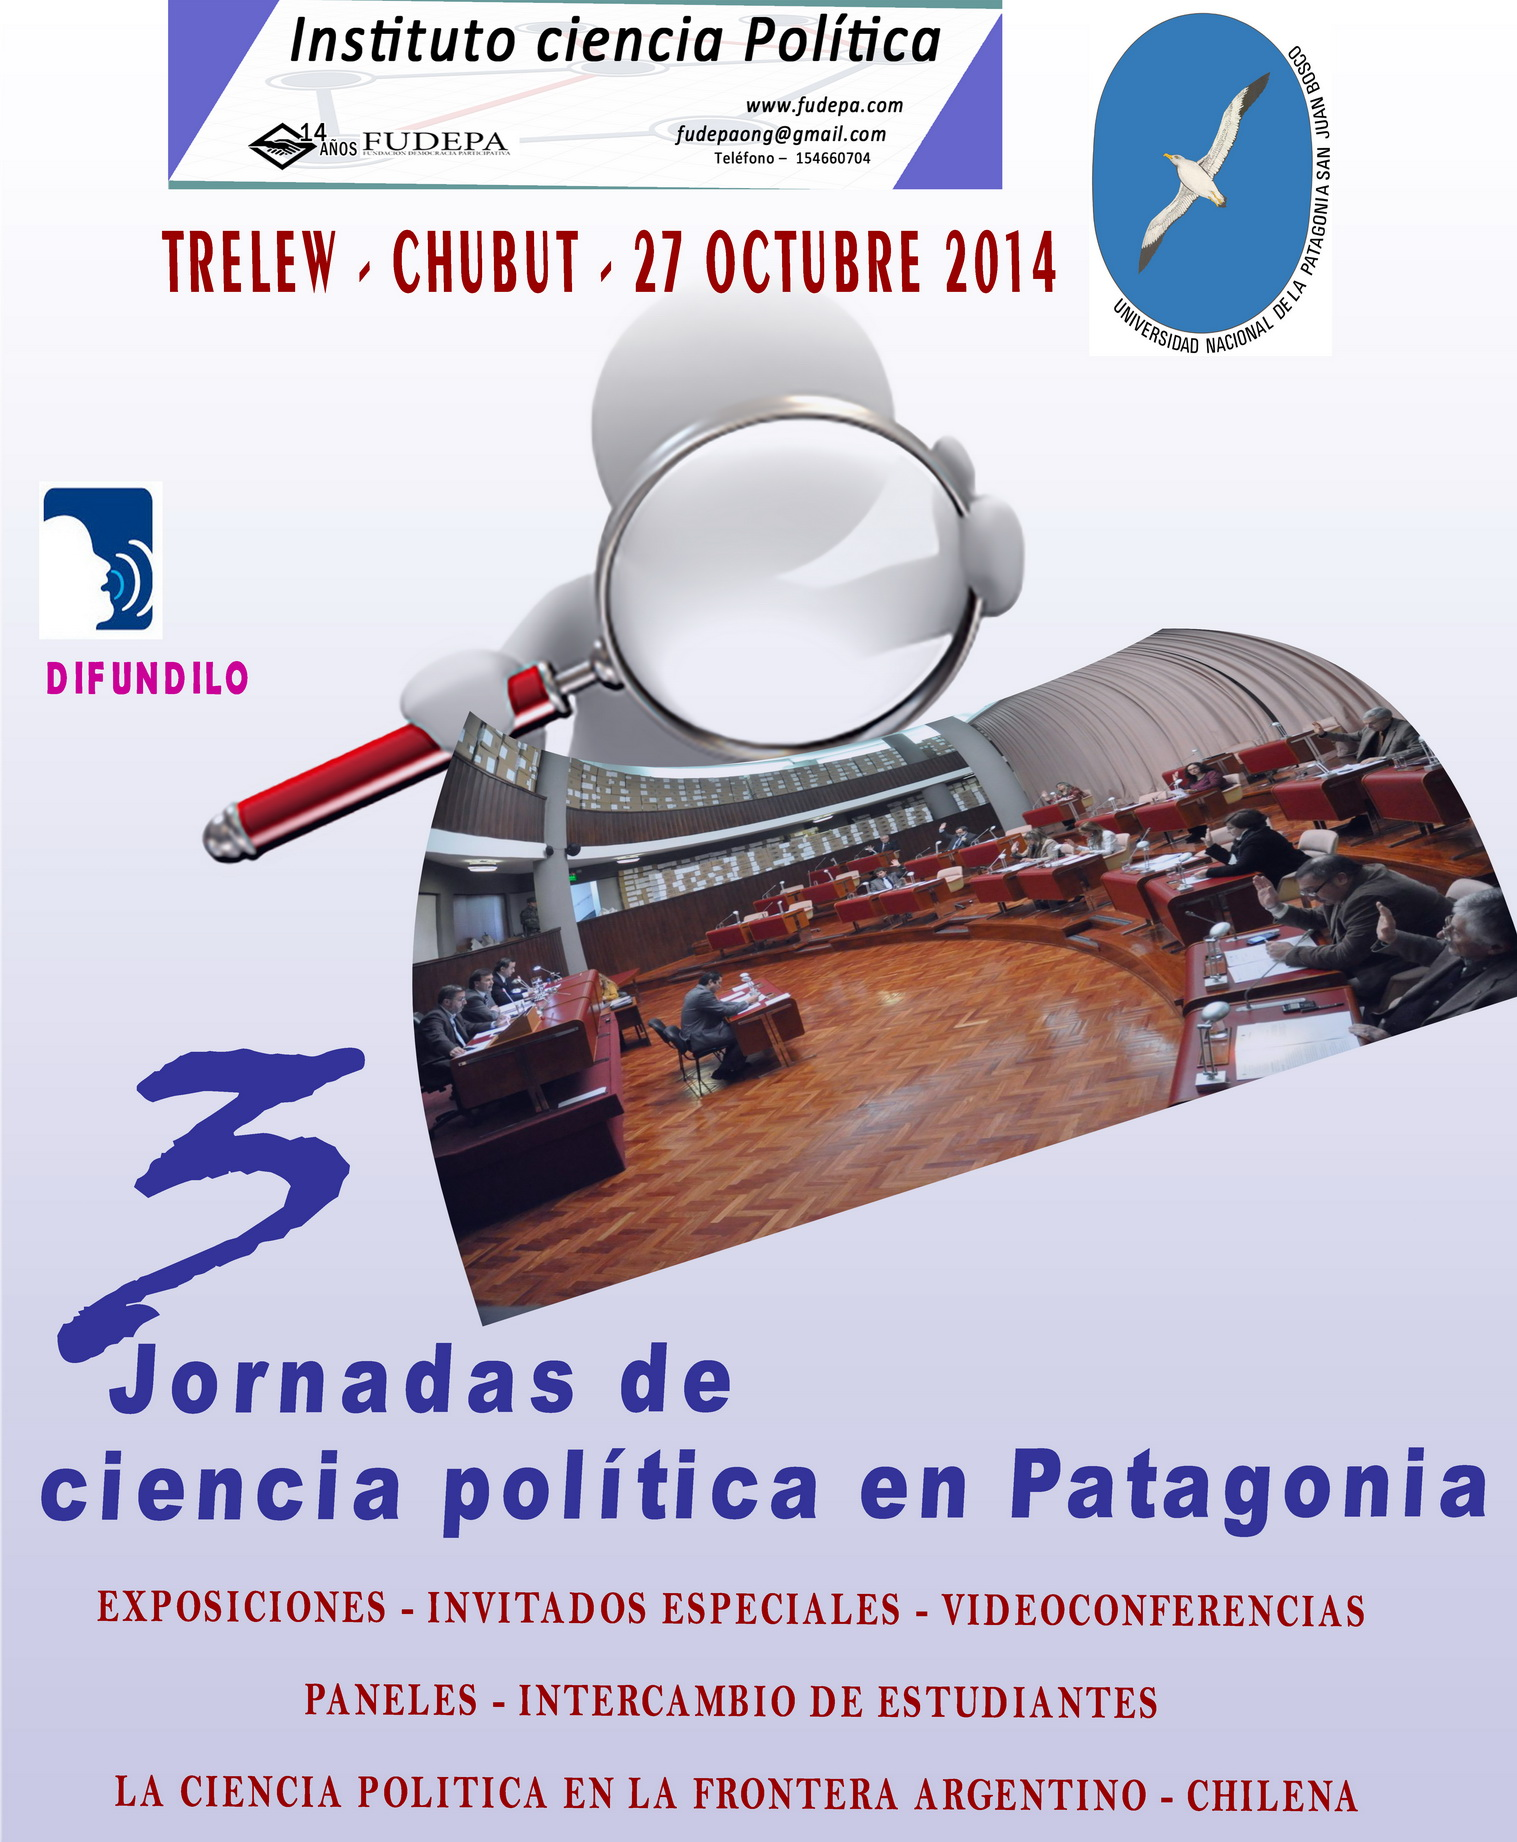 afiche 3 jornadas ciencia politica